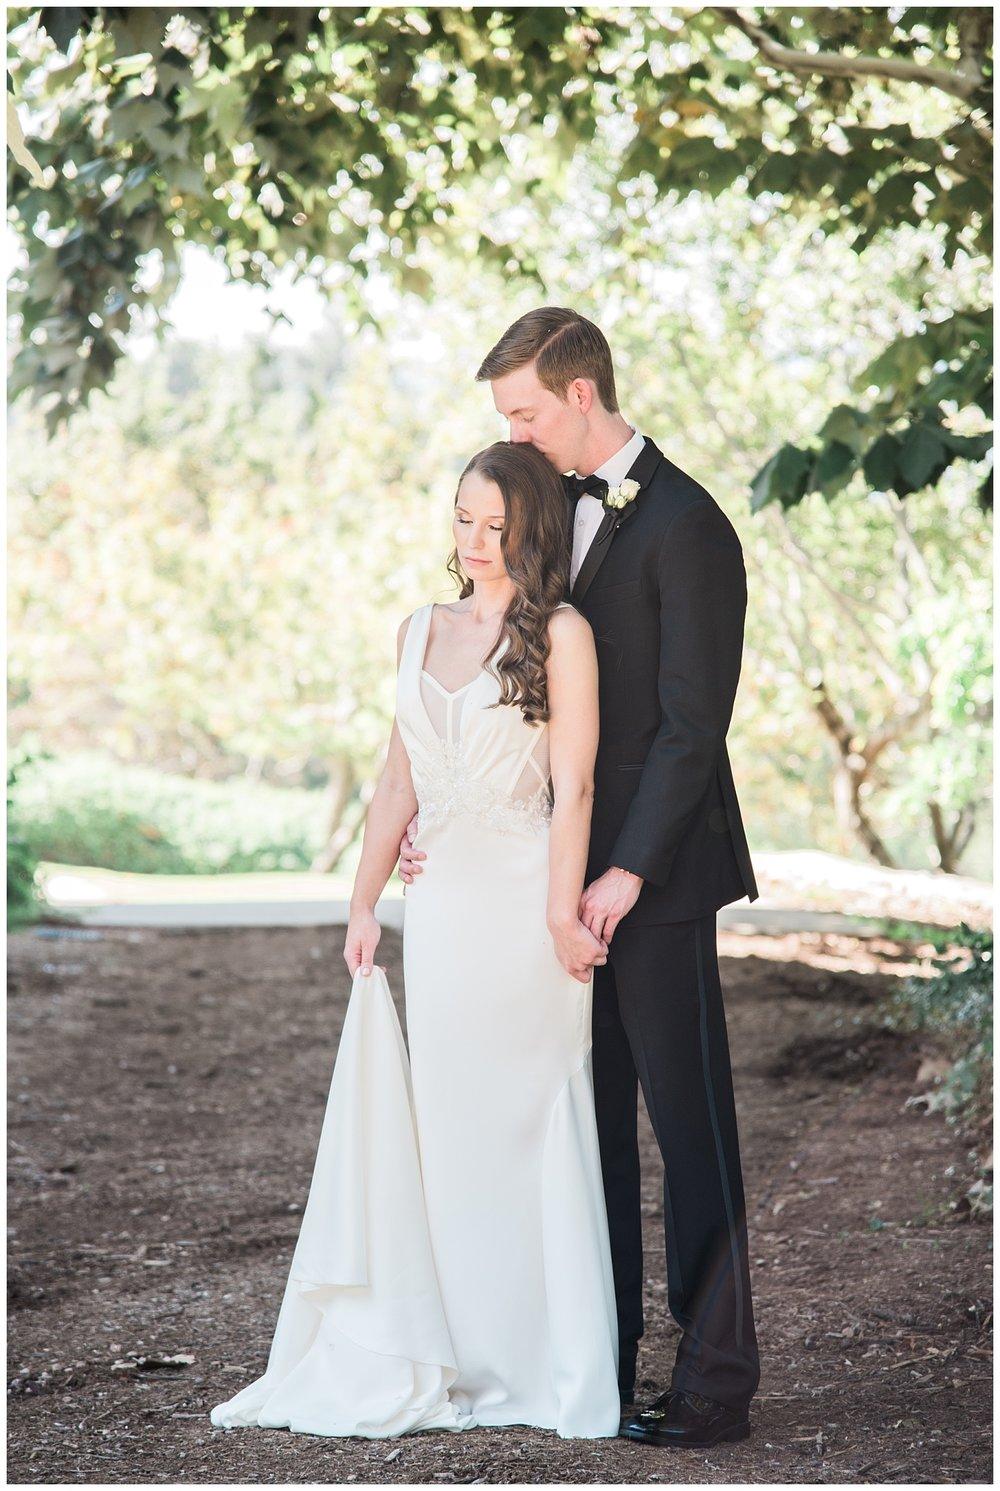 Chambers Wedding Villa De Lago Austin Texas Photographers Madeleine Nicole Photography